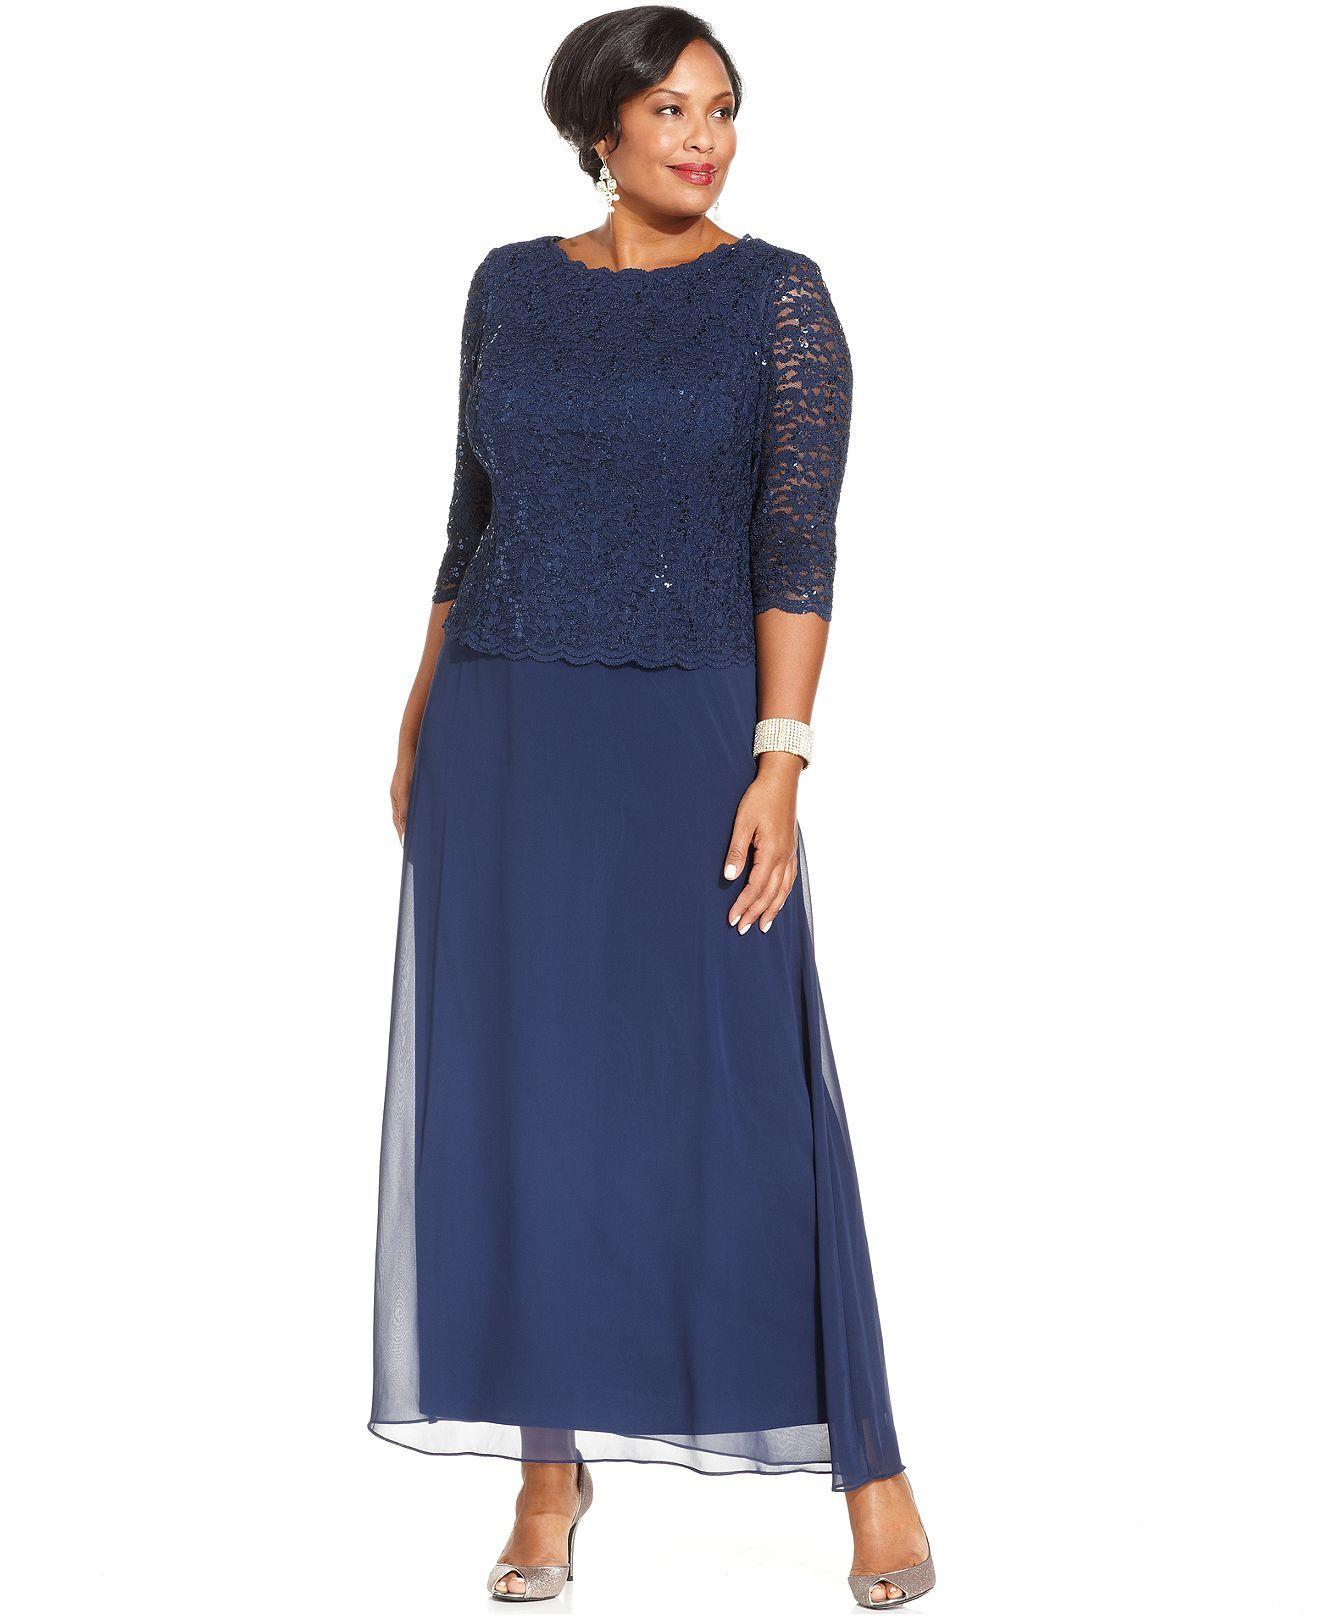 00138aaa16d Alex Evenings Plus Size Three-Quarter-Sleeve Sequined Lace Gown - Plus Size  Dresses - Plus Sizes - Macy s